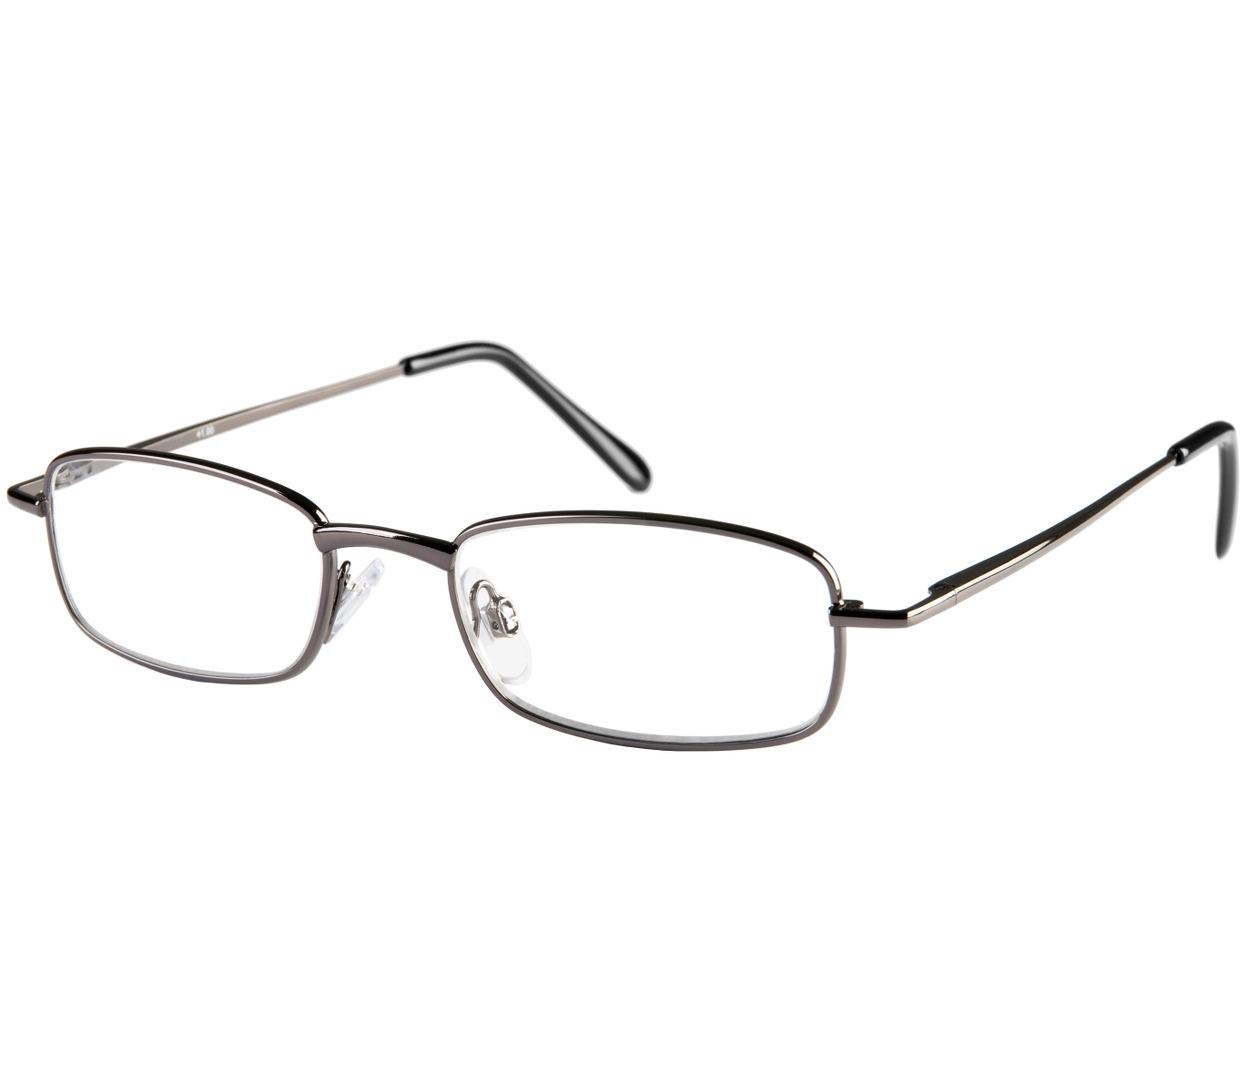 24c32aeb720 Trendy Reading Glasses 2015 2017 « Heritage Malta